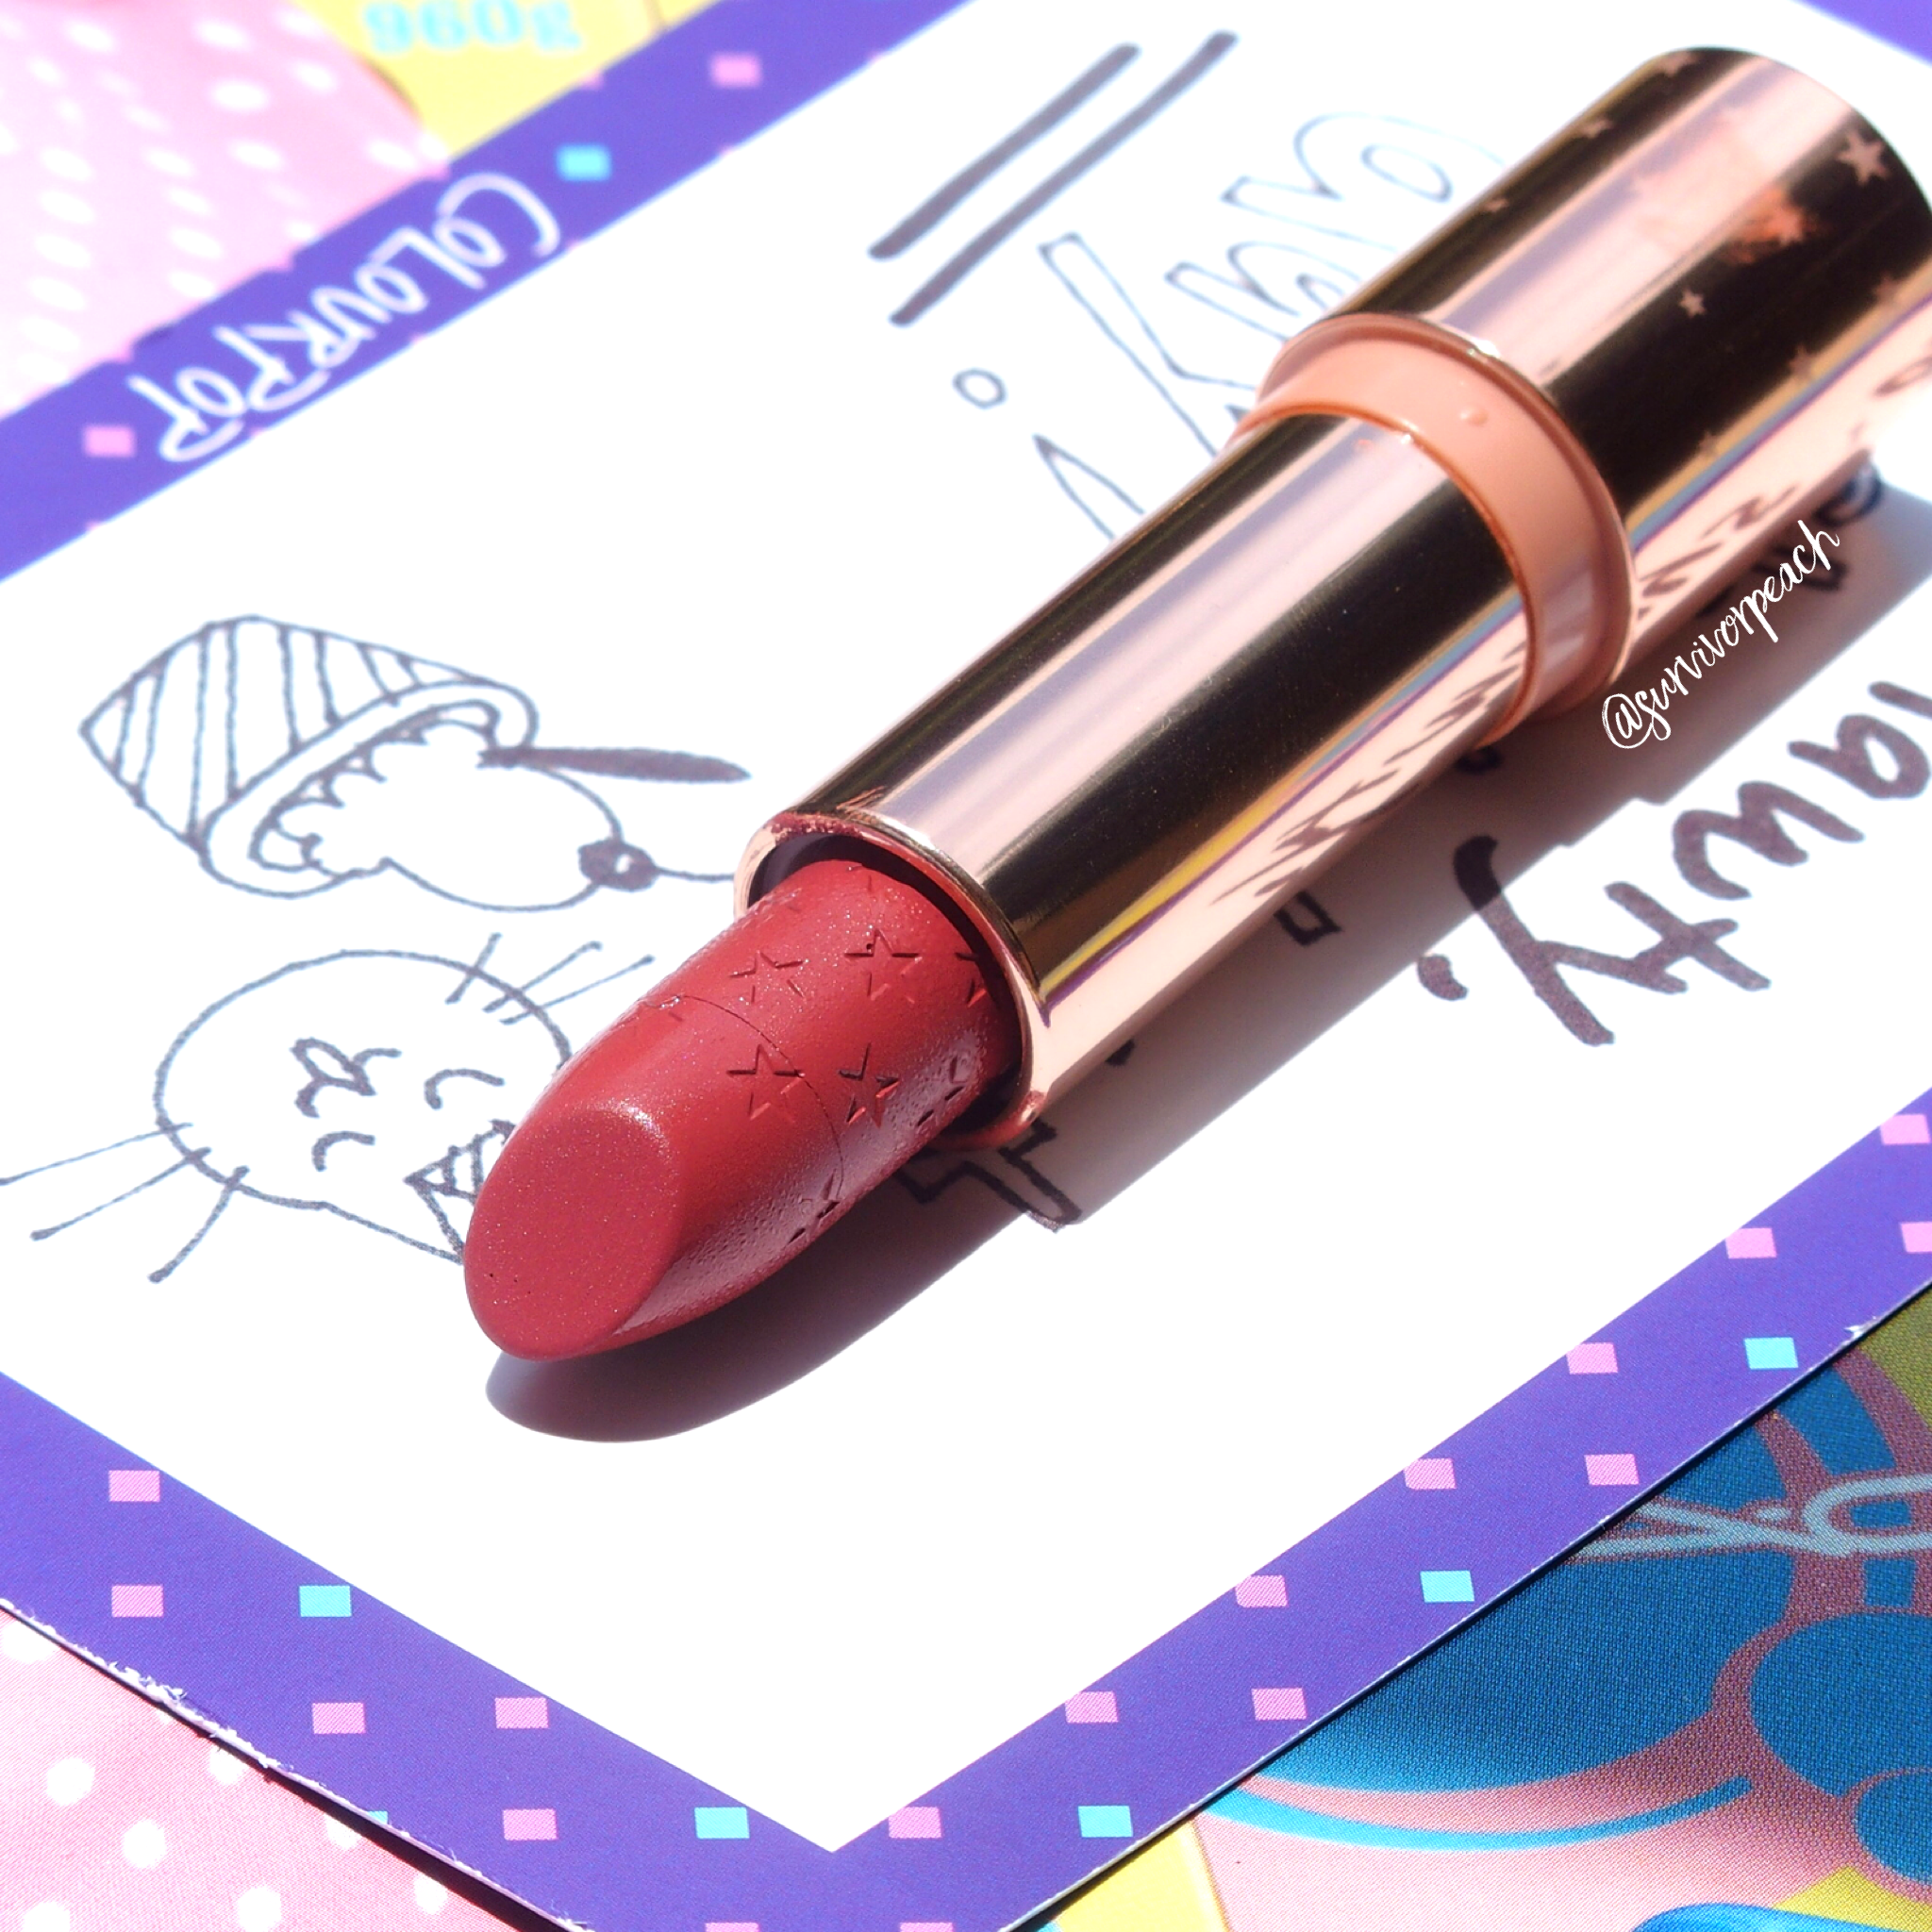 Colourpop Matte Lux Lipstick in Little League